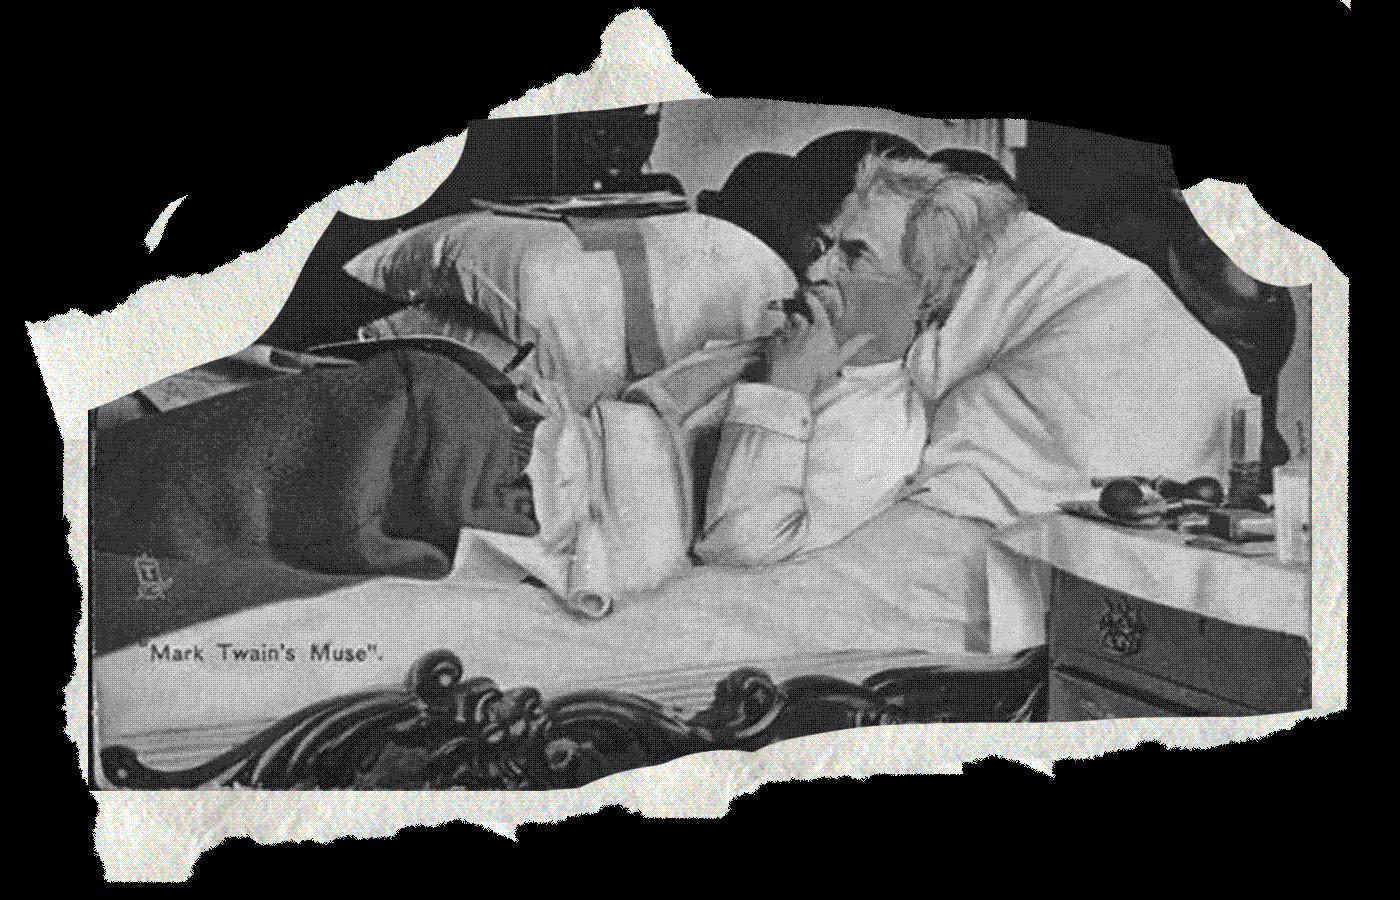 Марк Твен. Иллюстрация: Букмейт. Фото: University of Virginia Mark Twain Print Collection